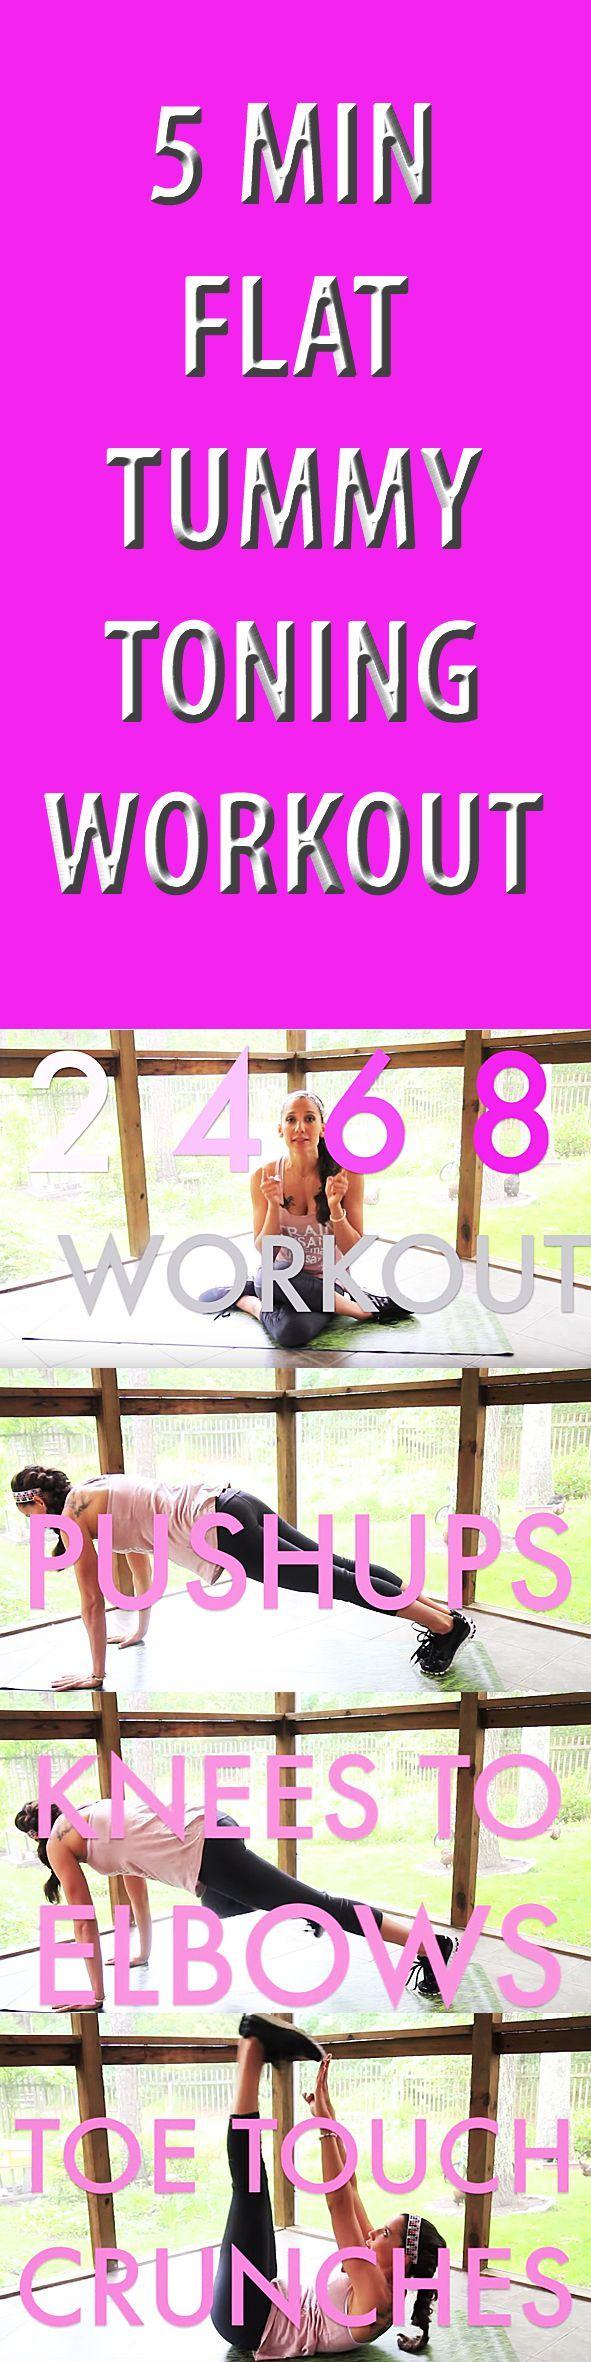 5 Min Flat Tummy Toning Workout. #sixpack #abs #coreworkout #abworkout #sixpackworkout #abexercise #flatbelly #flattummy